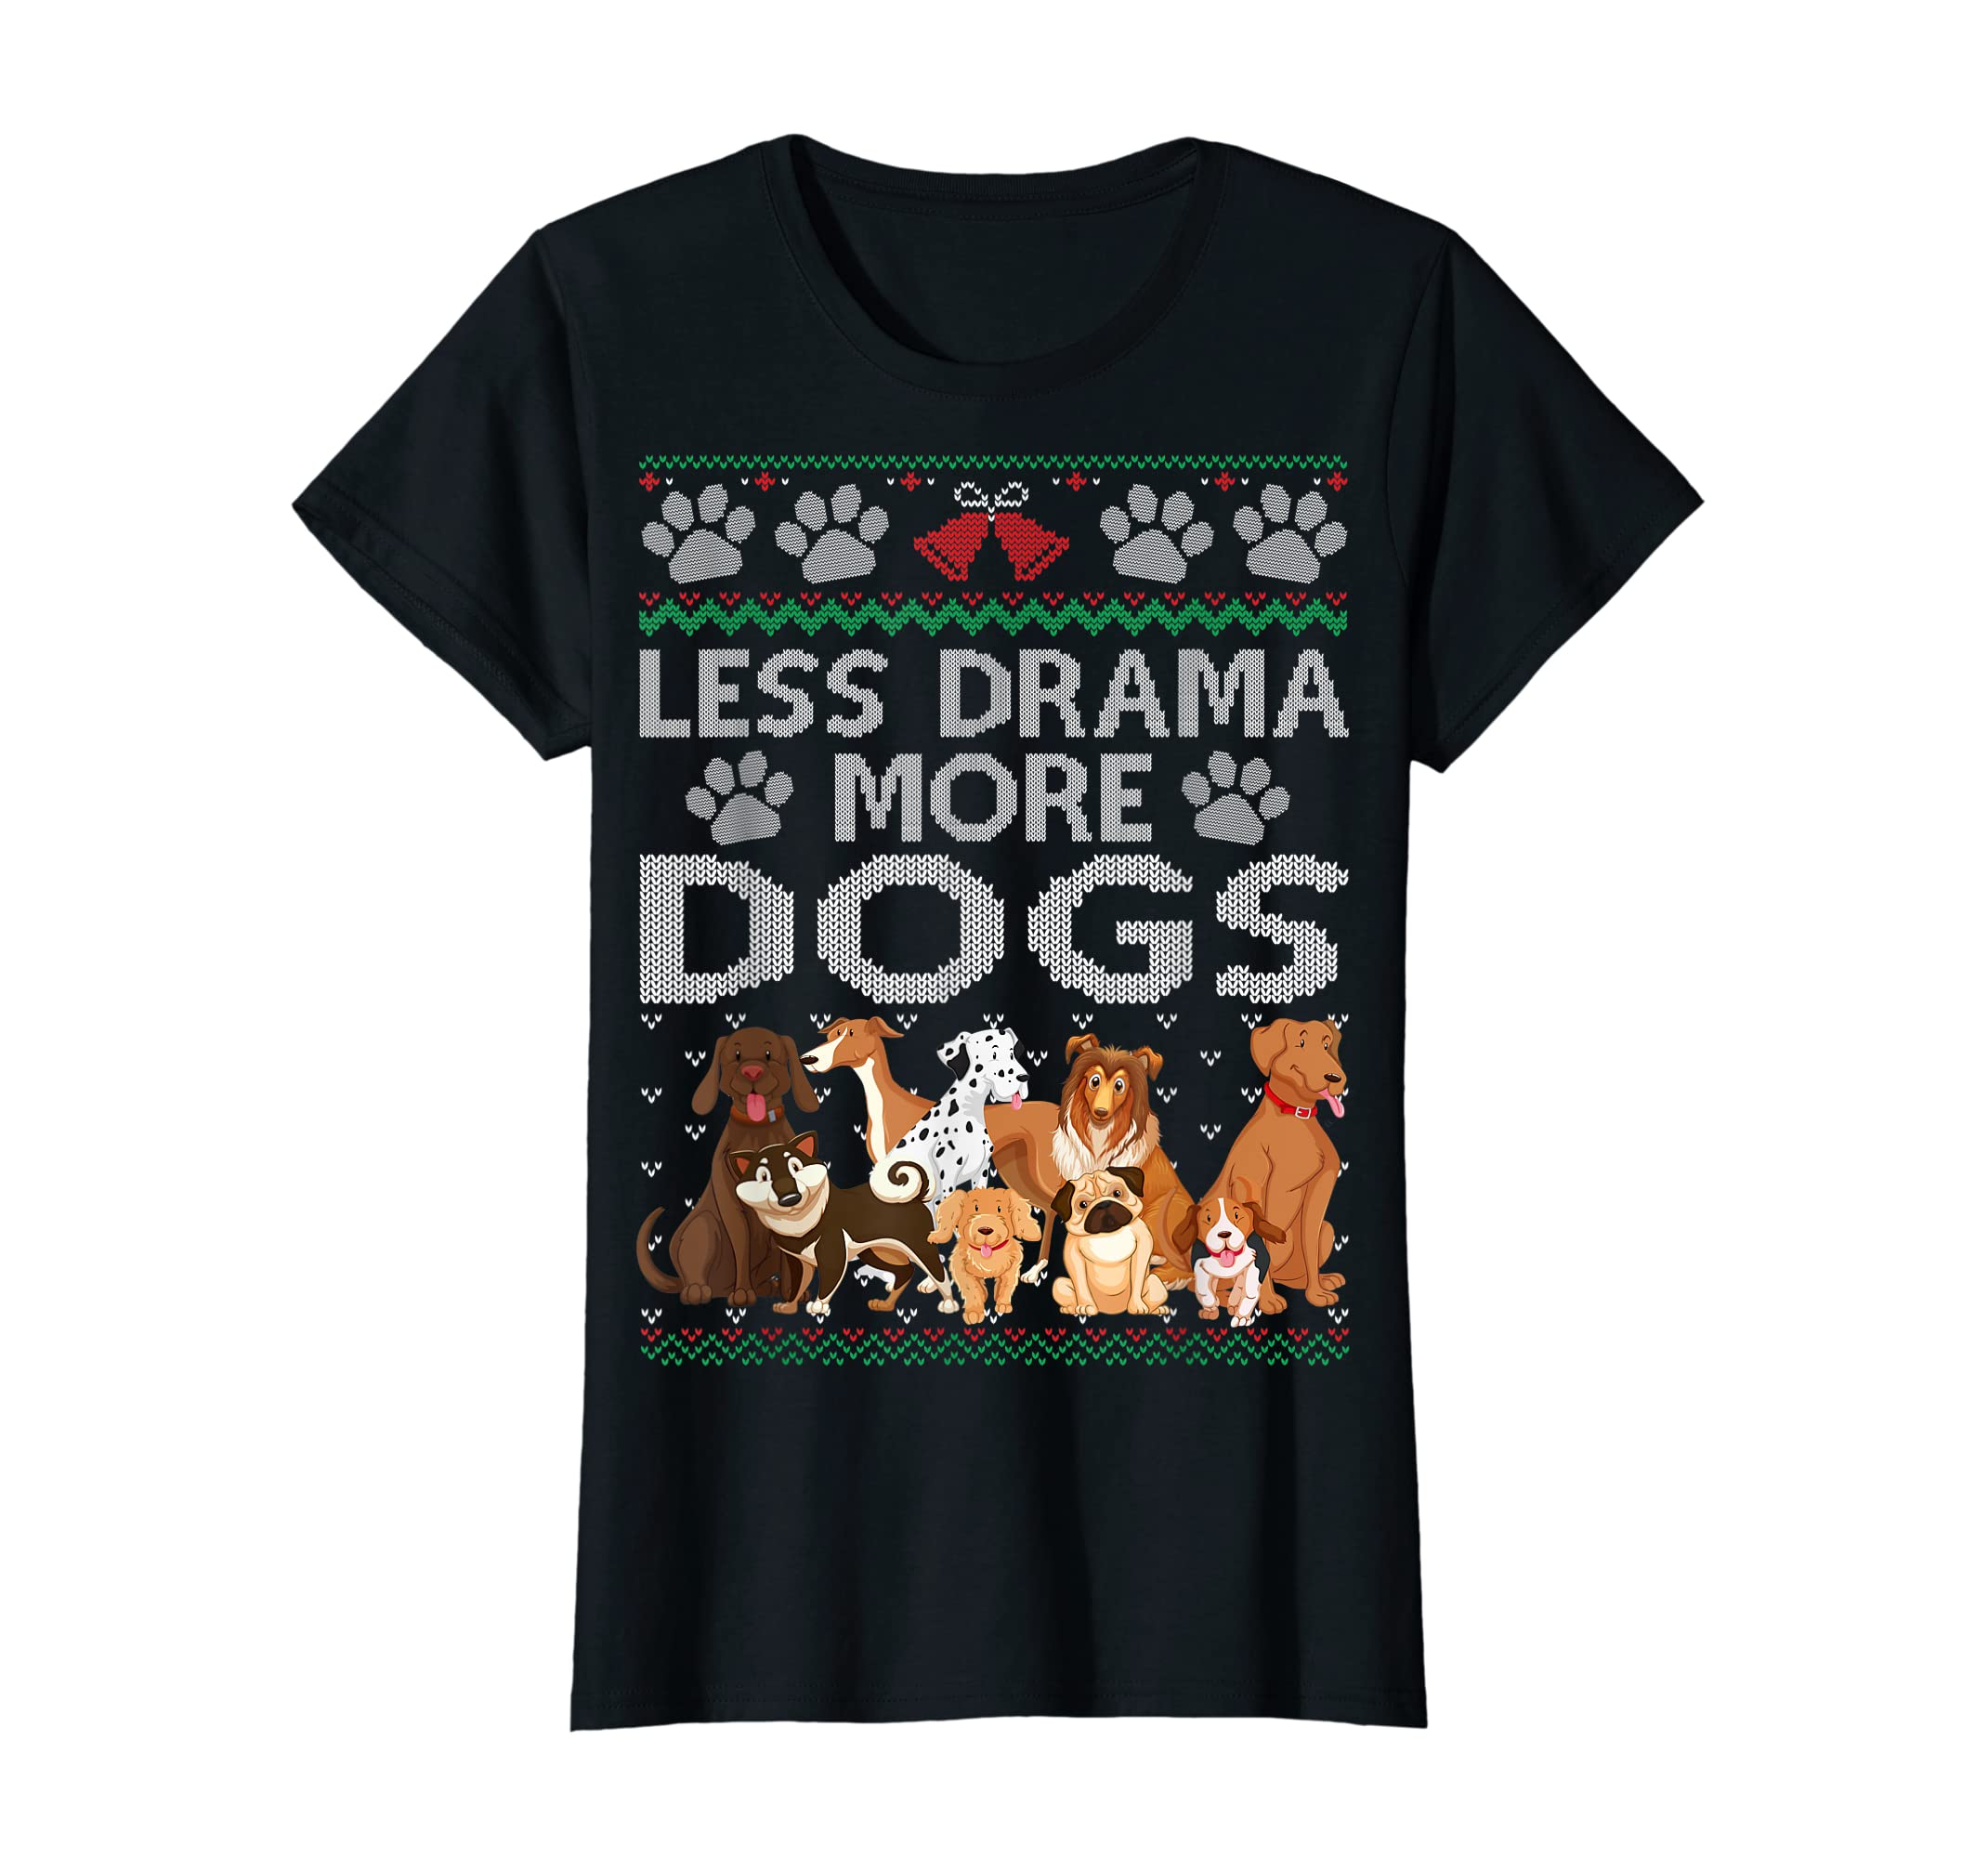 Less Drama More Dogs Cute Christmas Ugly Xmas Sweater Gift T-Shirt-Women's T-Shirt-Black